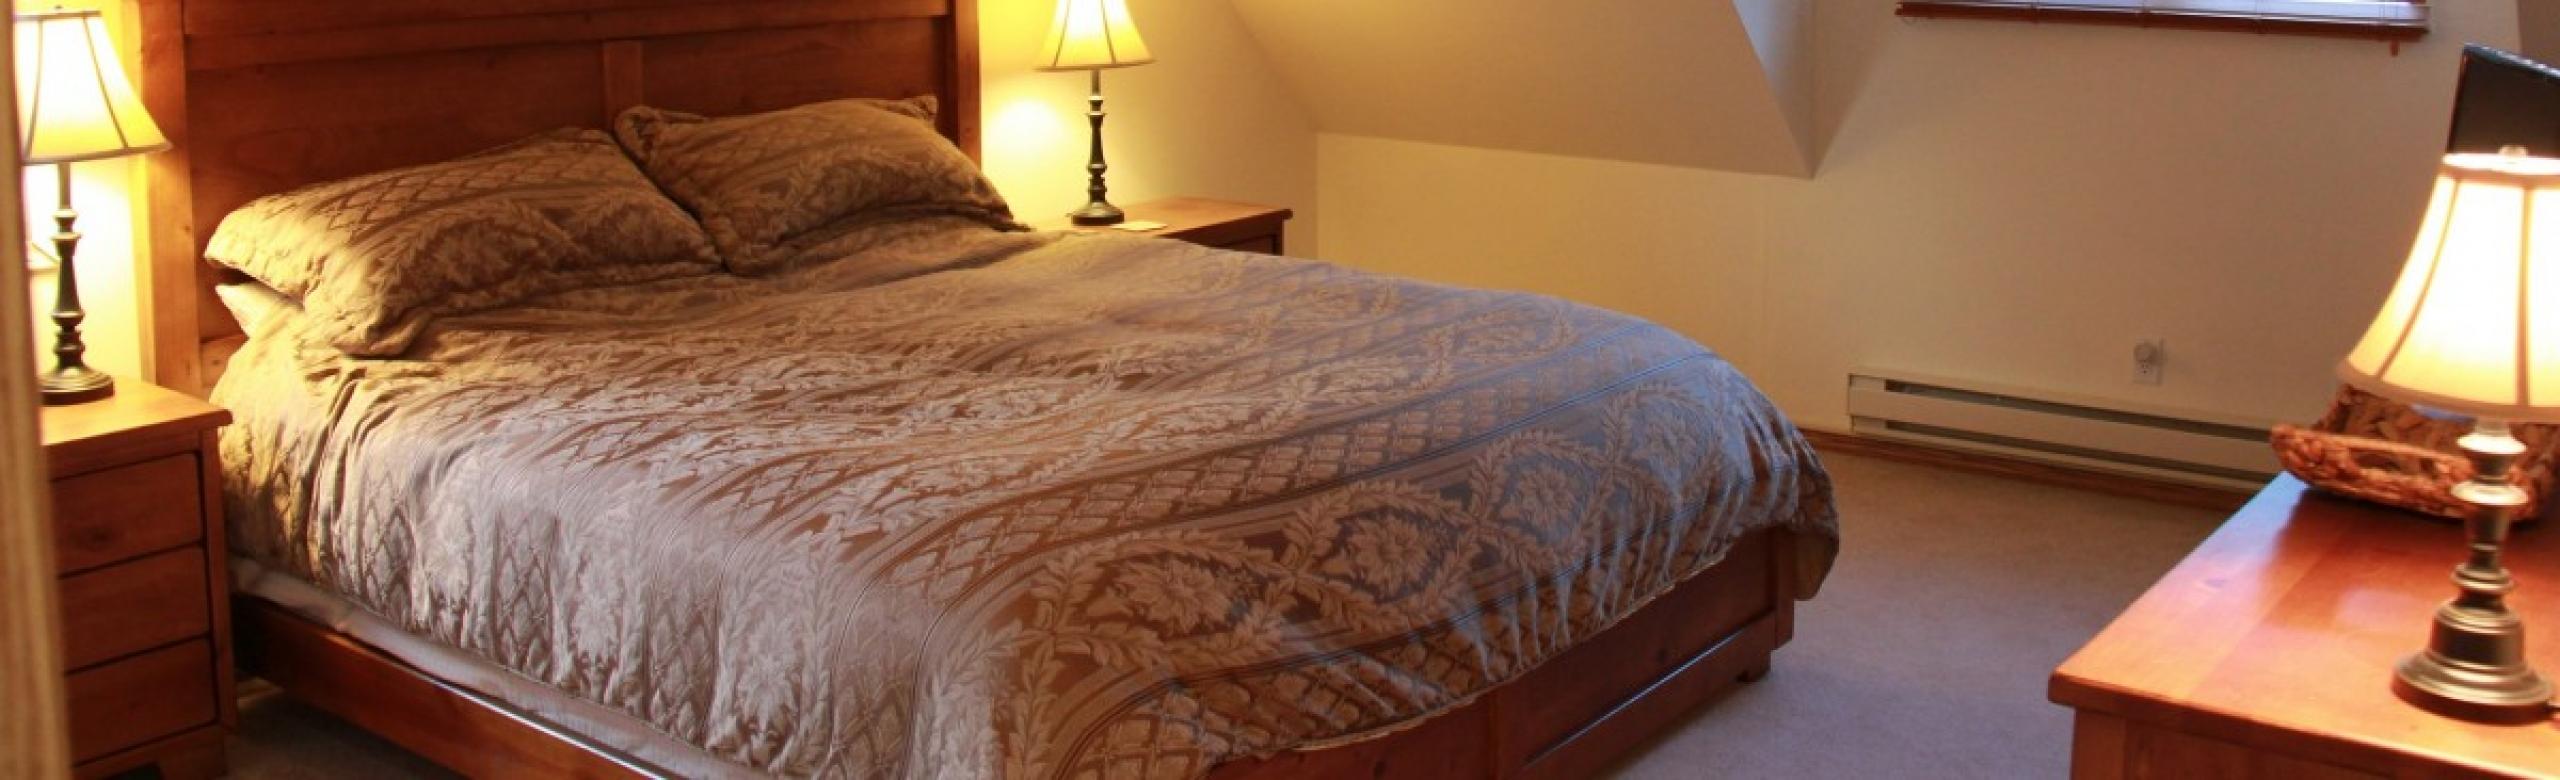 bedroom slider 3